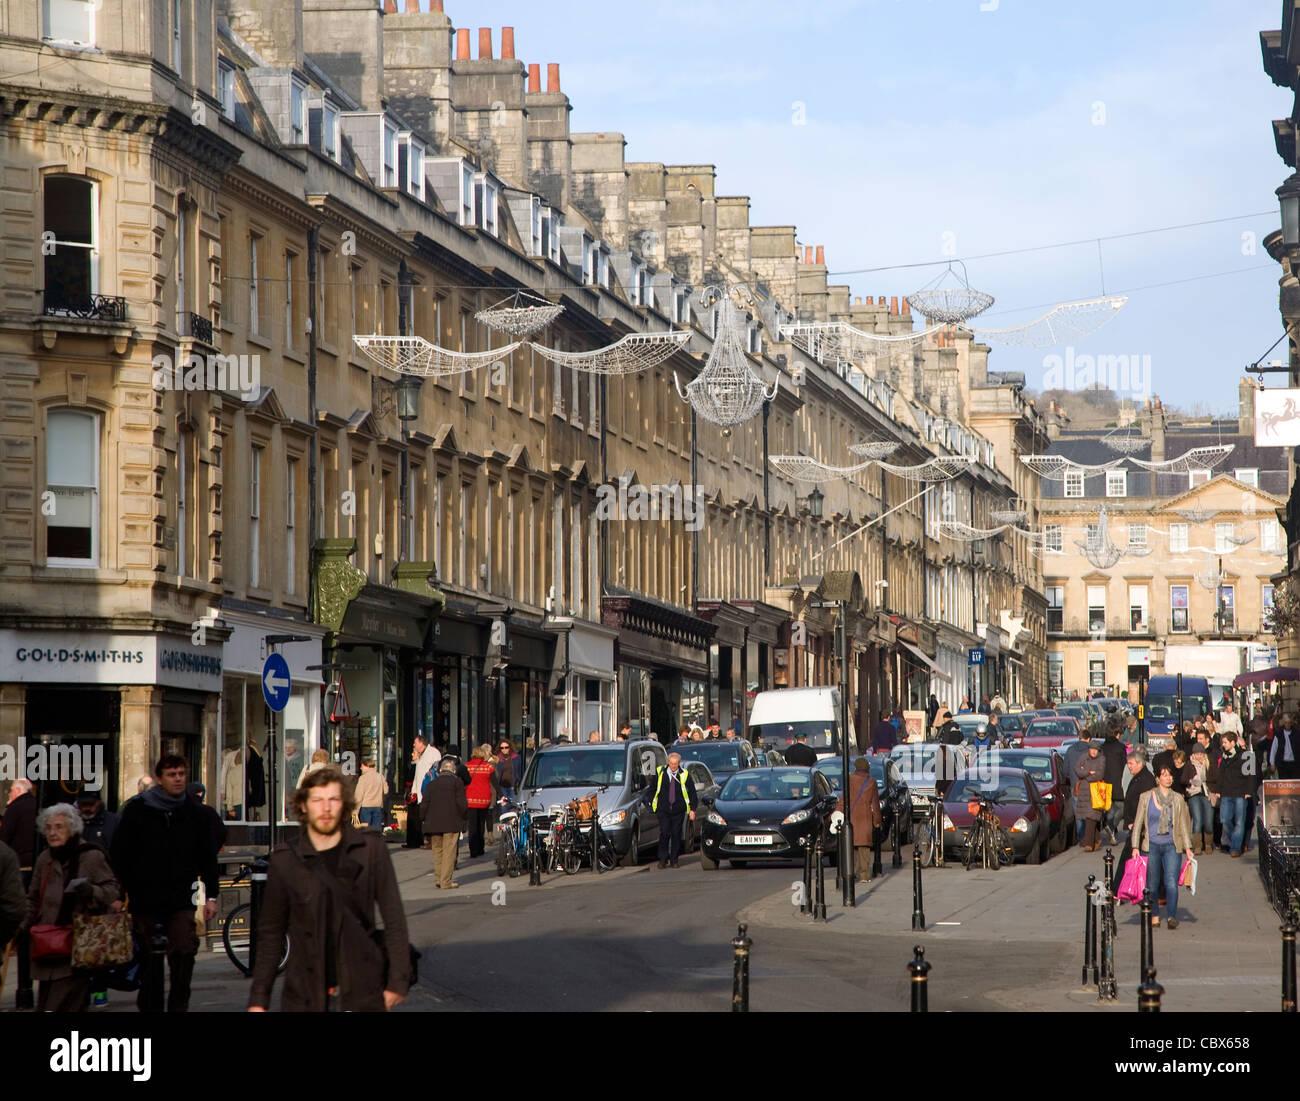 Christmas shoppers, Milsom Street, Bath, England - Stock Image